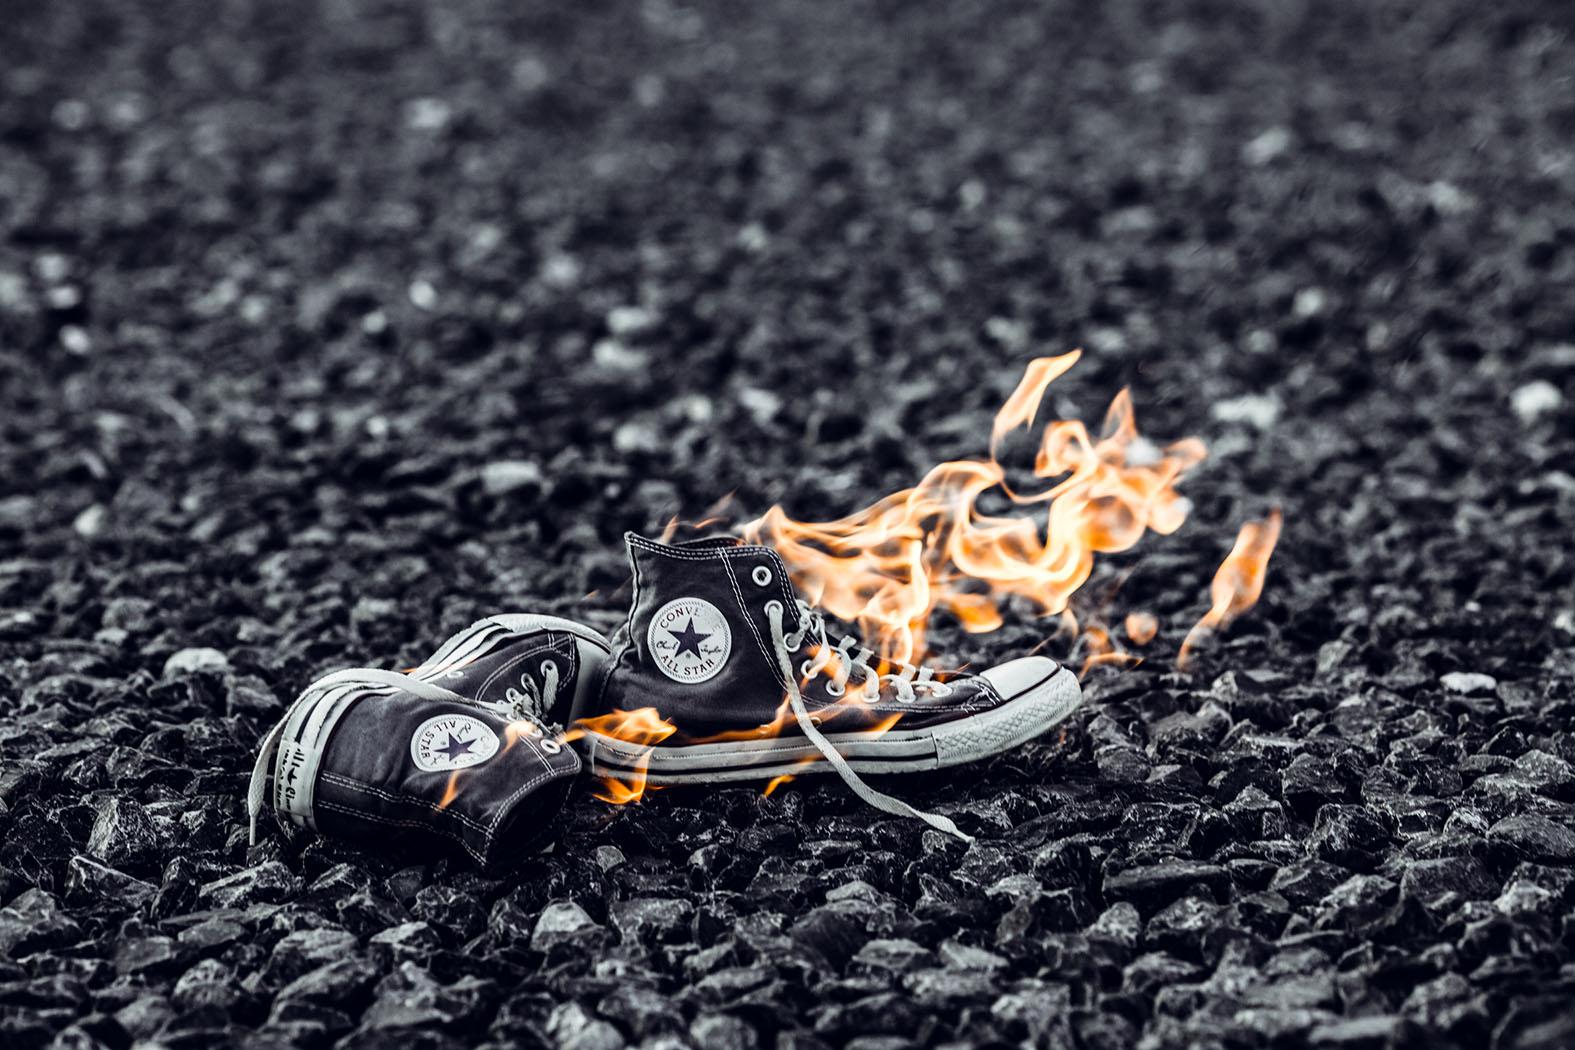 All Star - Toutes les Etoiles qui brûlent - Djavanshir.n - Chuck Taylor